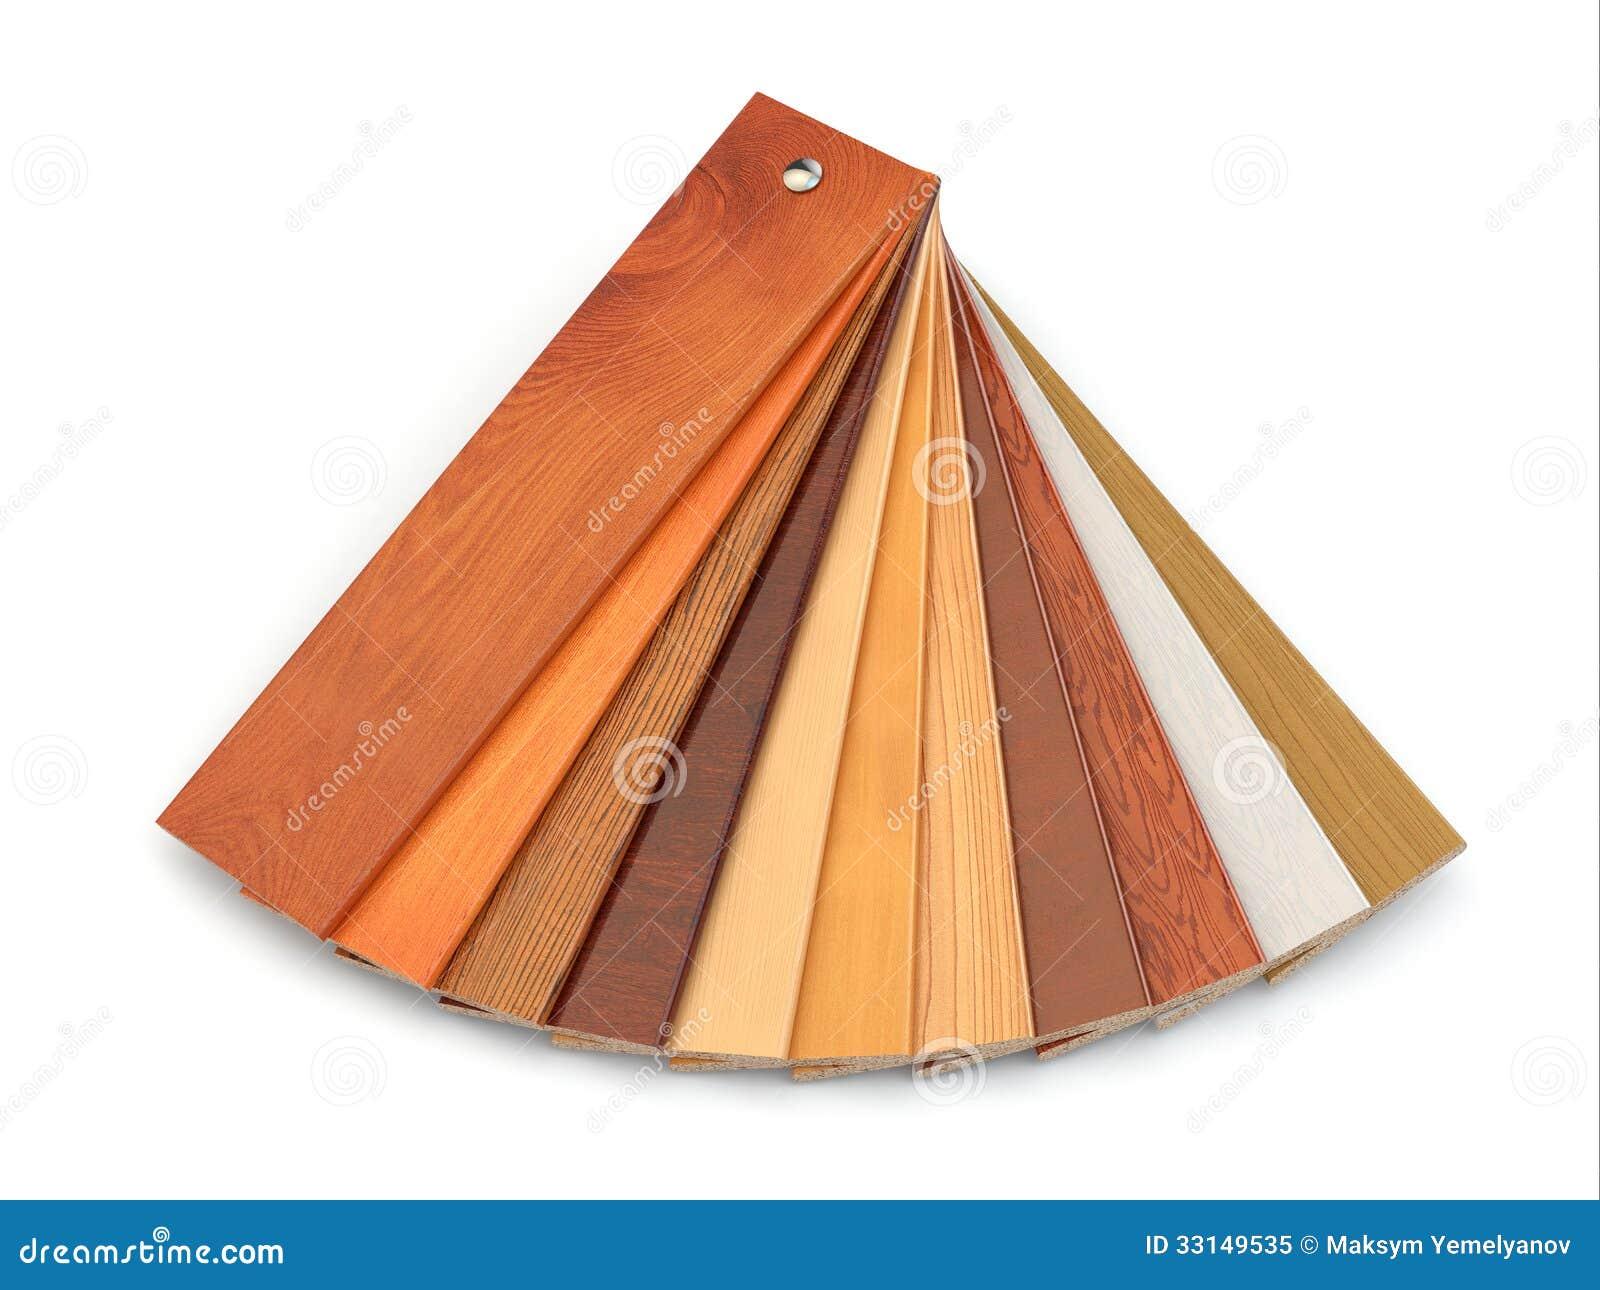 Flooring laminate or parqet samples royalty free stock for 3d laminate flooring